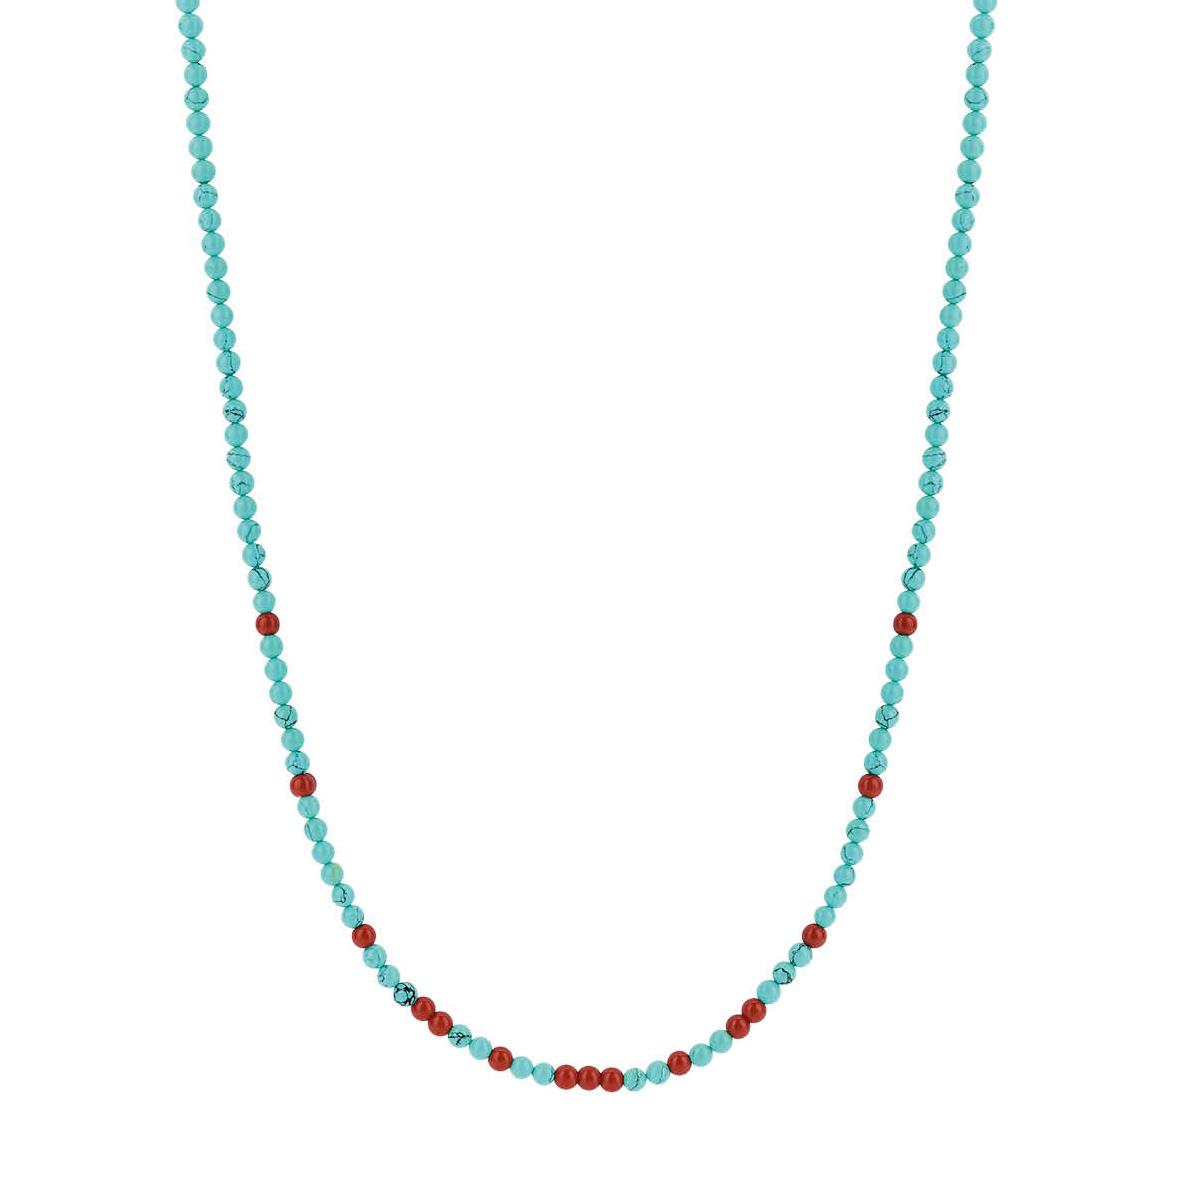 TI SENTO-Milano 3939TQ Ketting zilver turquoise-rood 38-48 cm